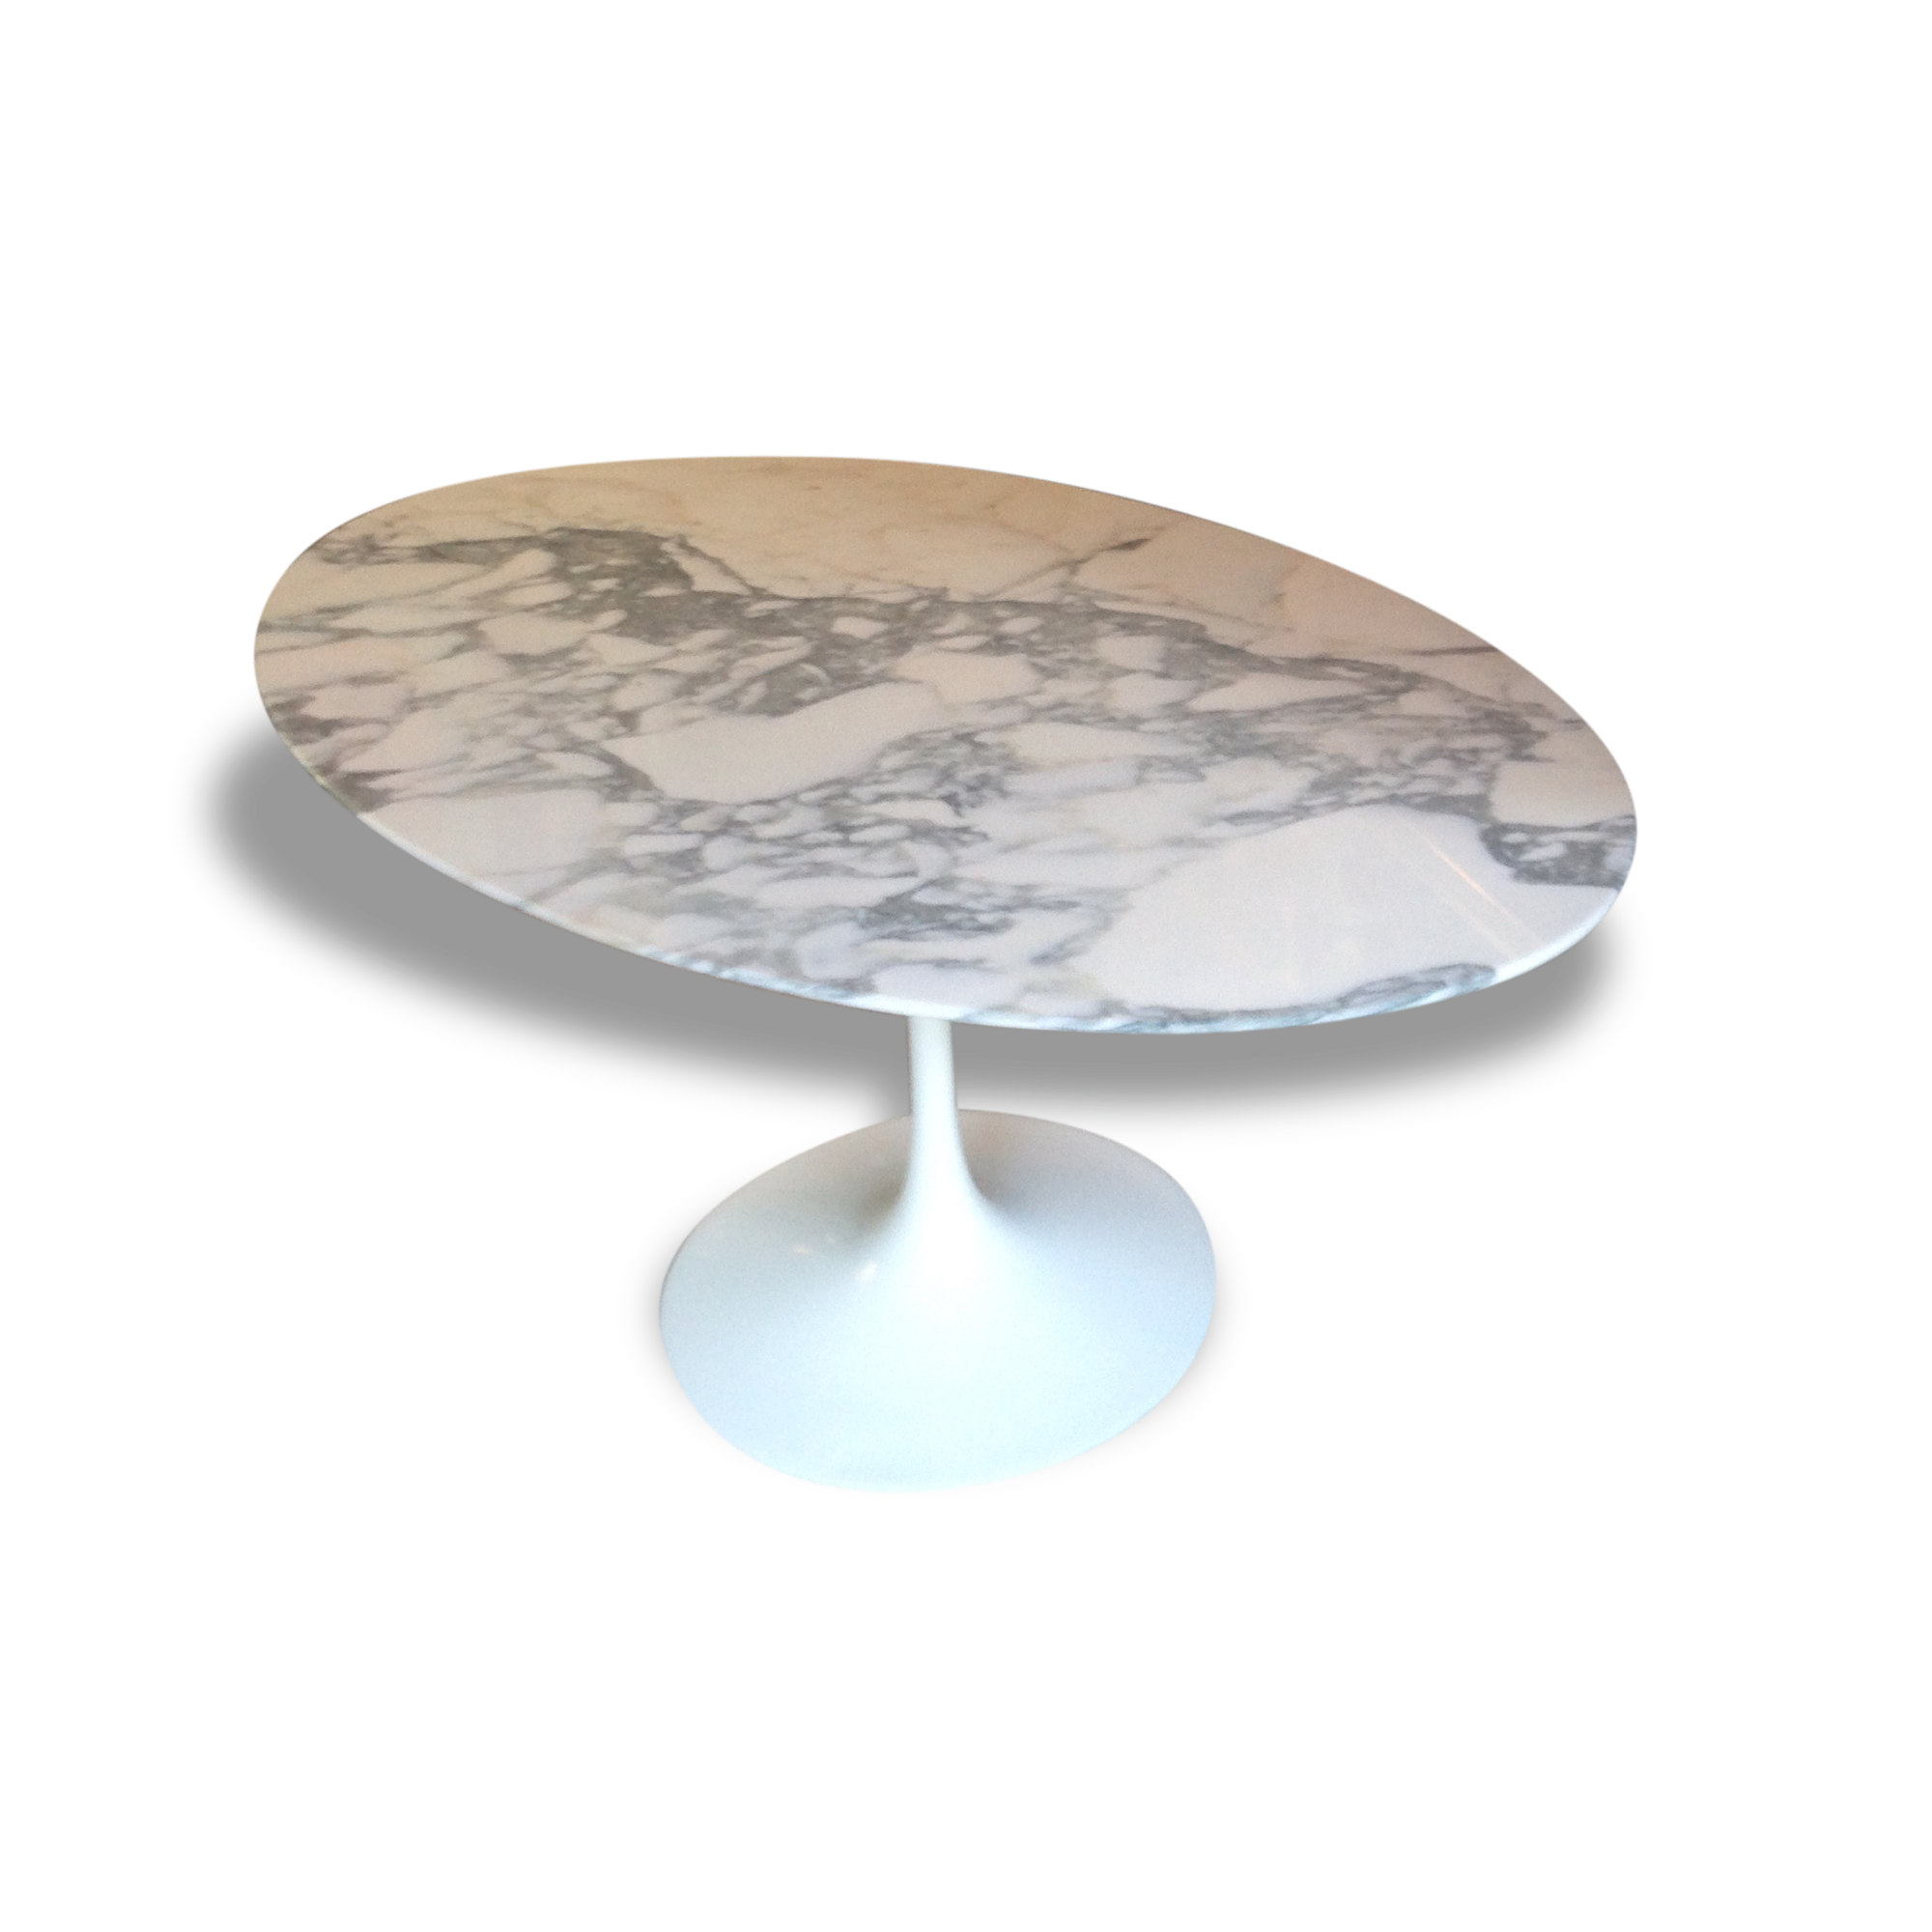 Einzigartig kreabel table basse id es de conception de for Kreabel table